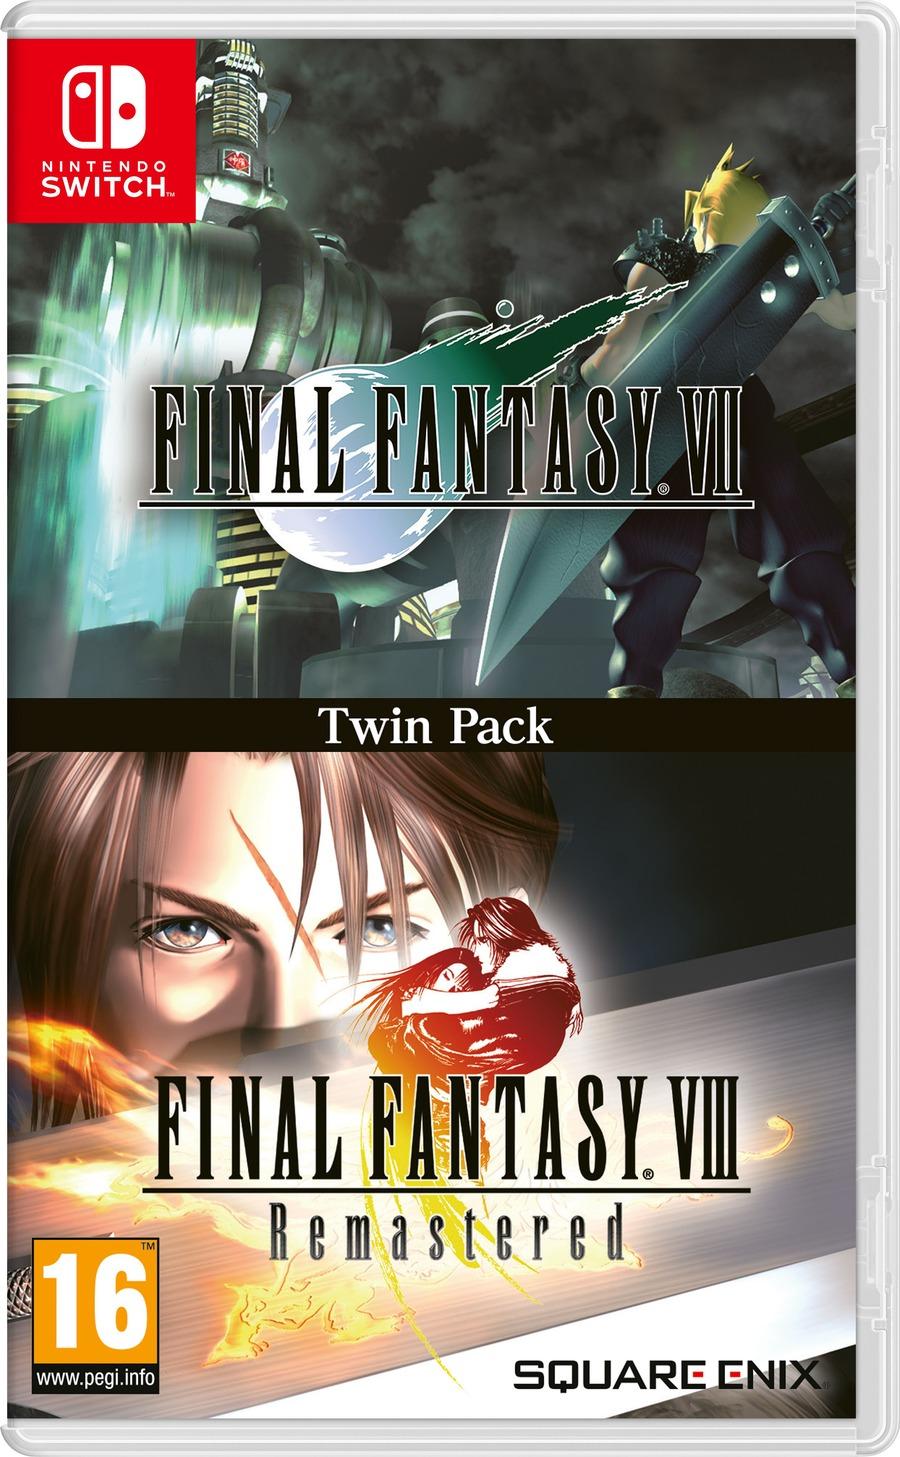 Final Fantasy 7/8 Twin Pack per Switch in arrivo a dicembre insieme a FF8 Remaster per PS4